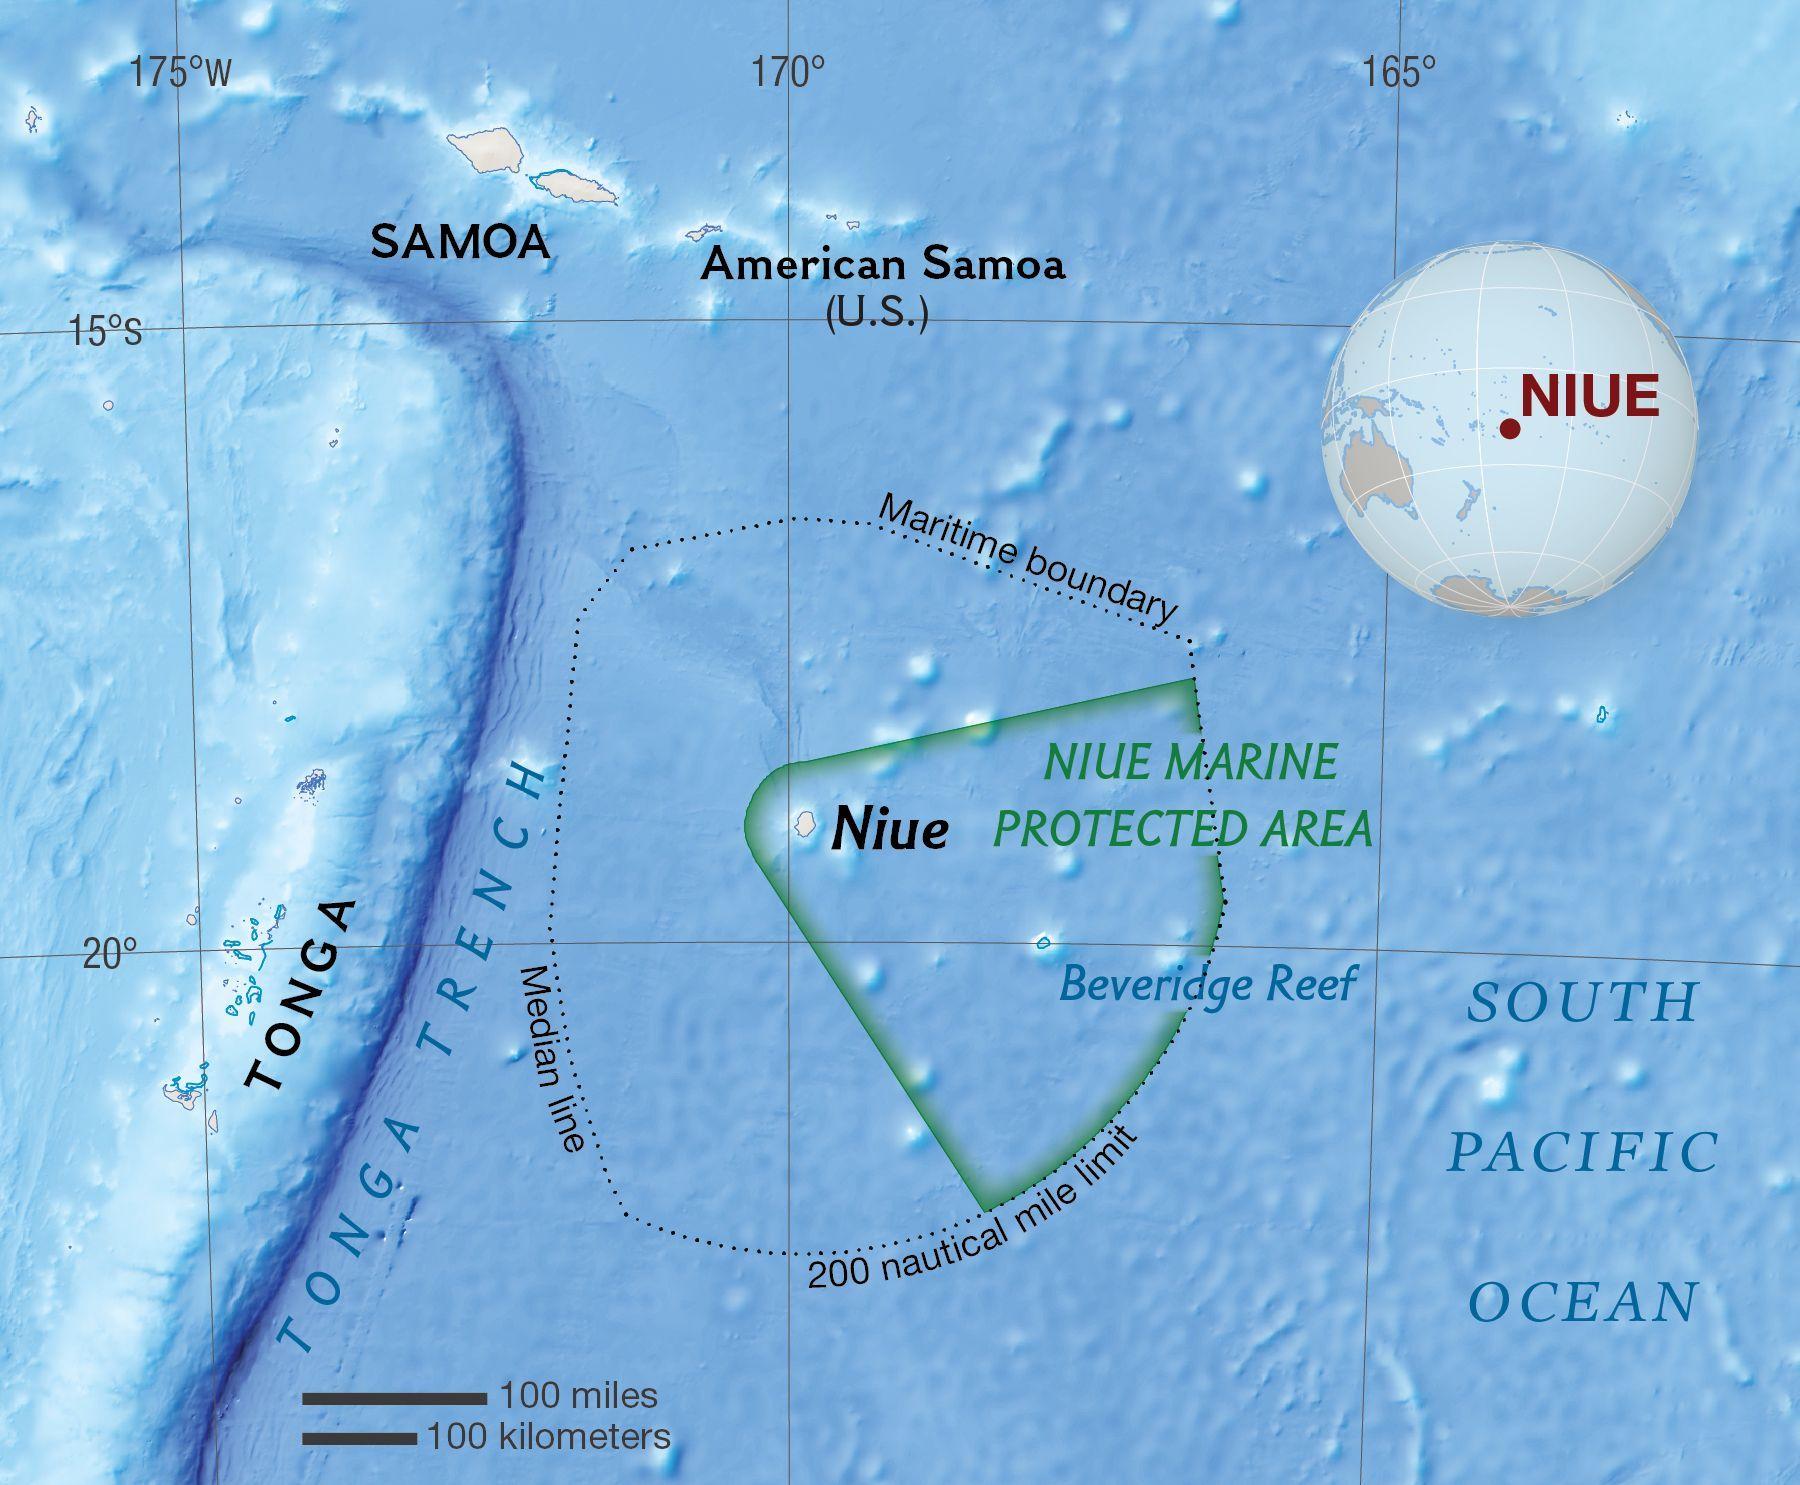 Niue National Geographic Society - Niue map